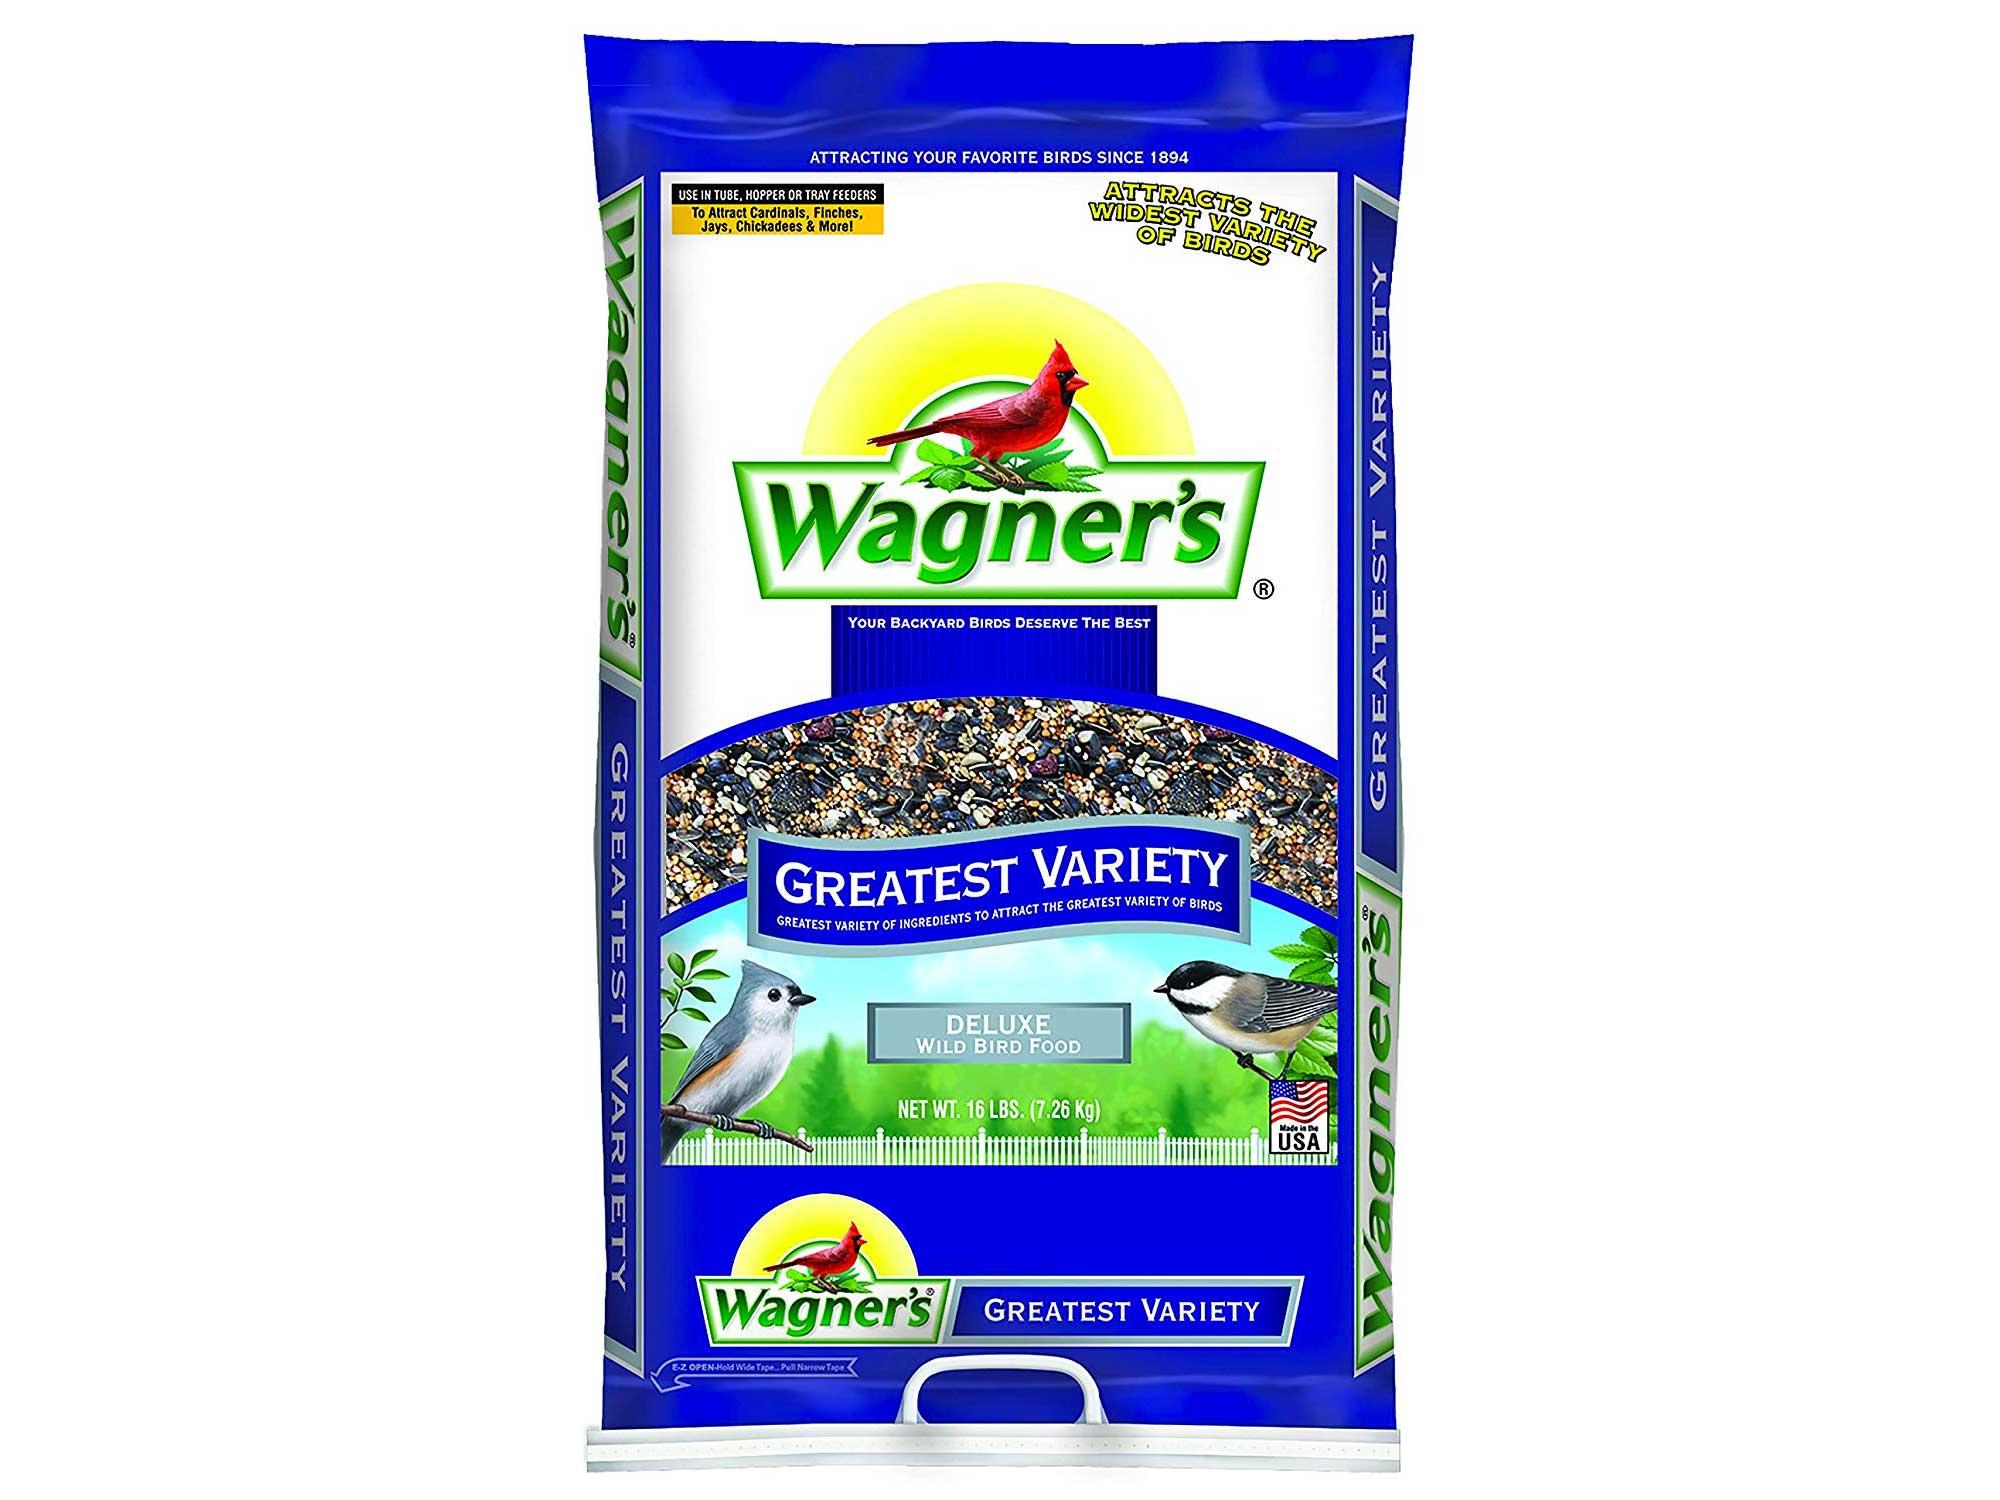 Wagners bird seed